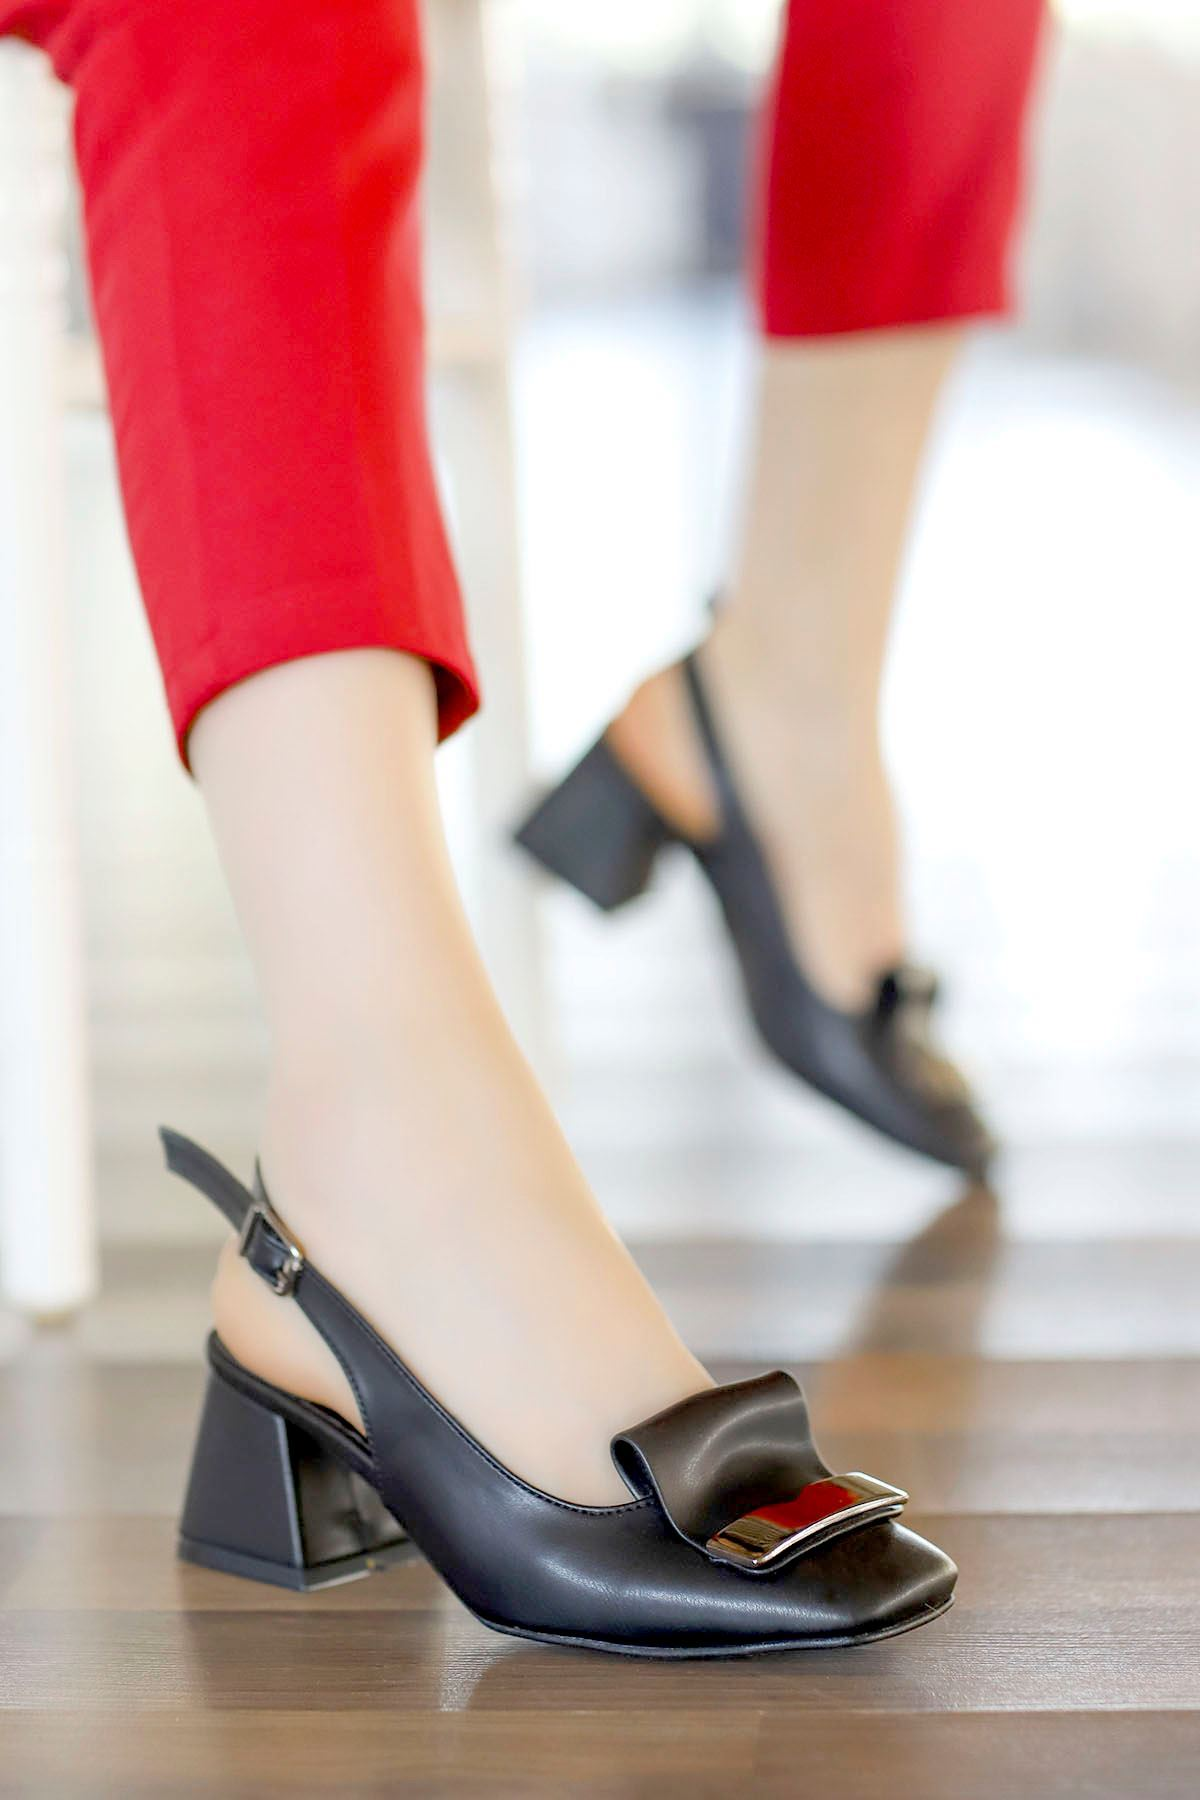 Nora Toka Detay Arka Açık Topuklu Ayakkabı Siyah Deri